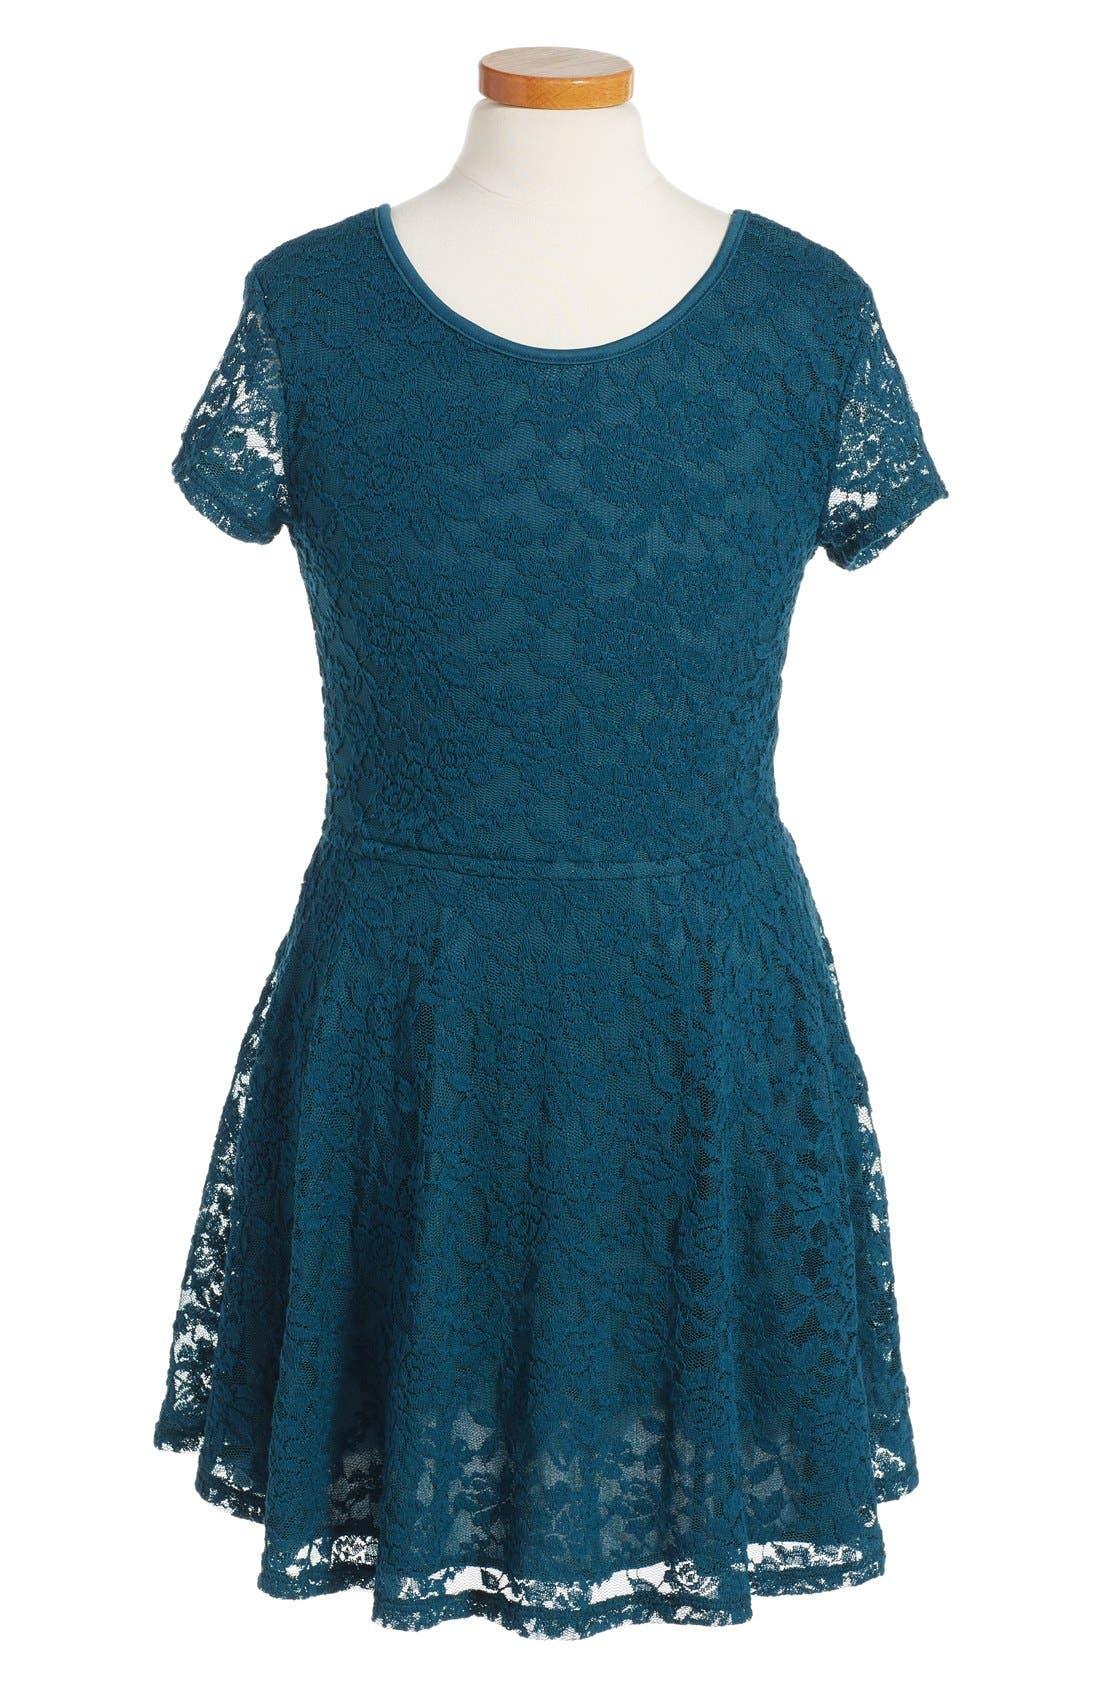 Alternate Image 1 Selected - Ruby & Bloom 'Jessamine' Lace Dress (Little Girls & Big Girls)